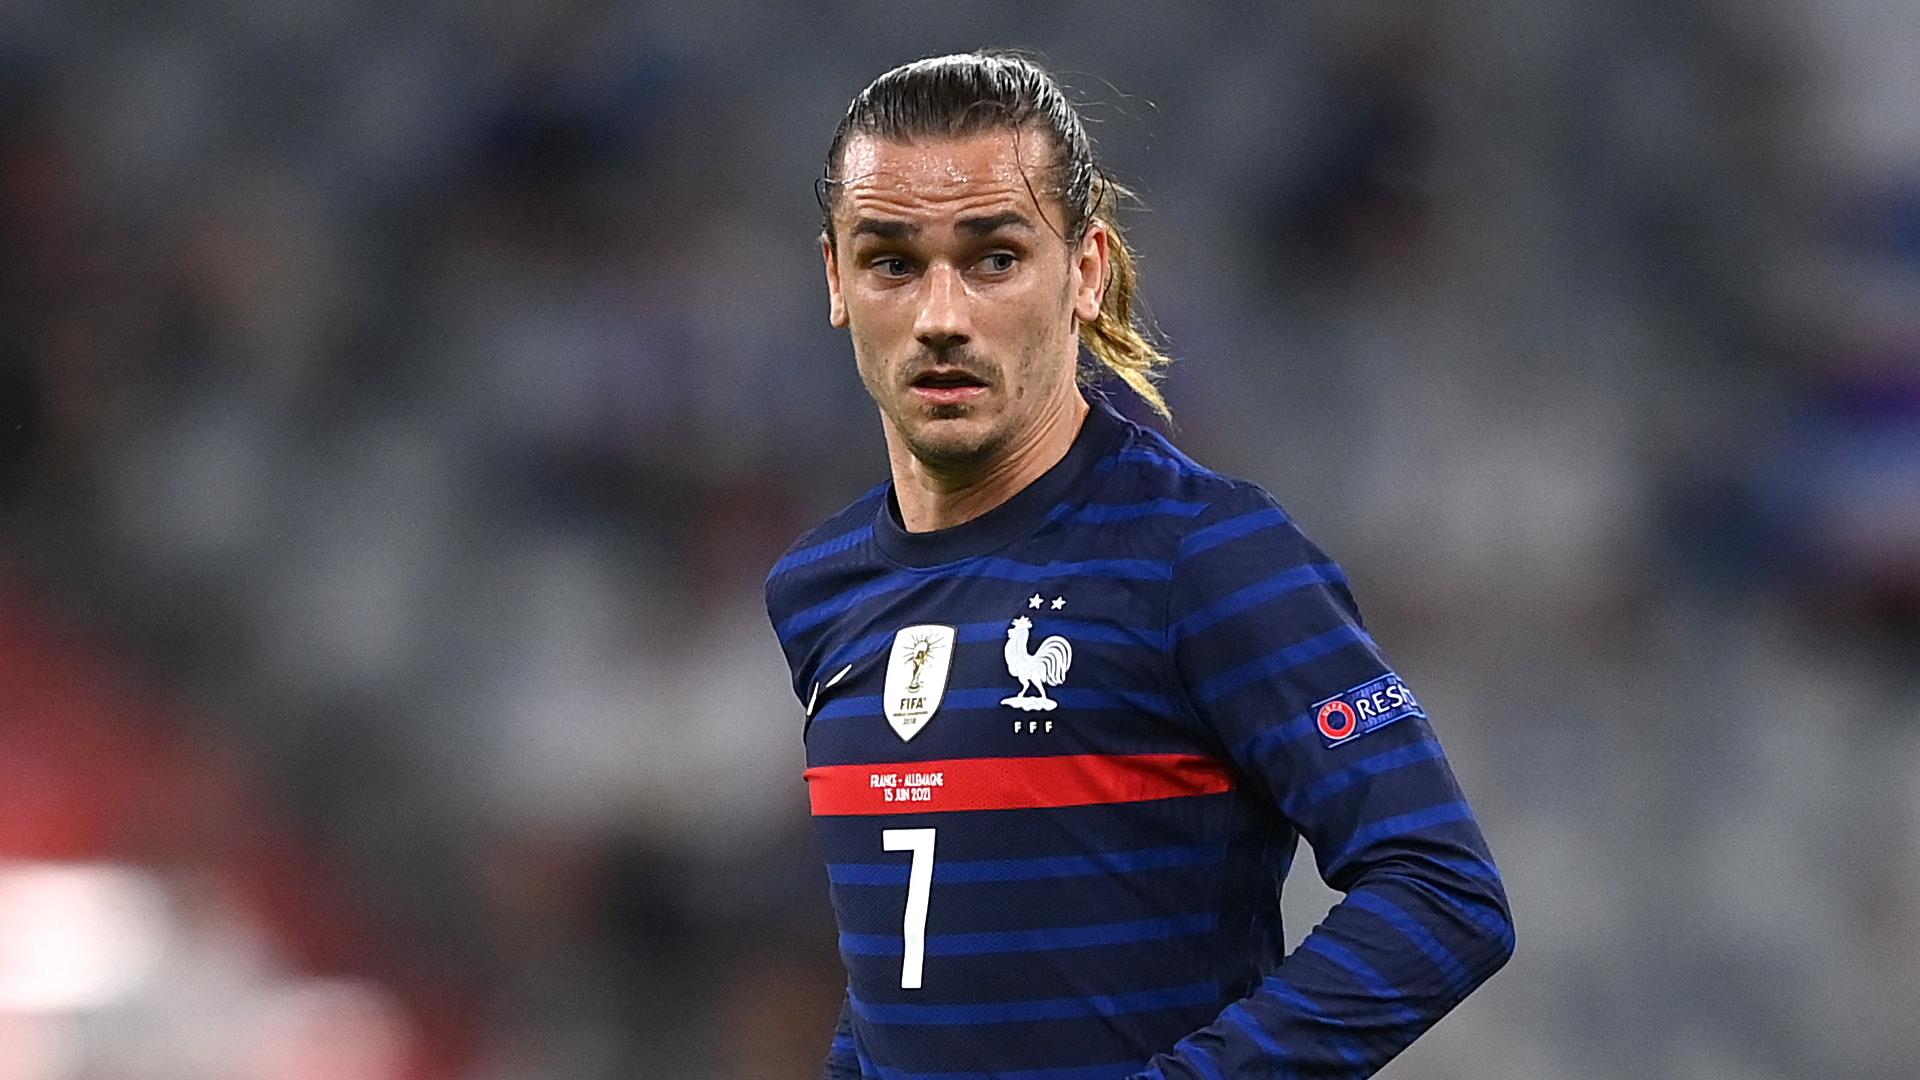 LIVE: France vs Switzerland